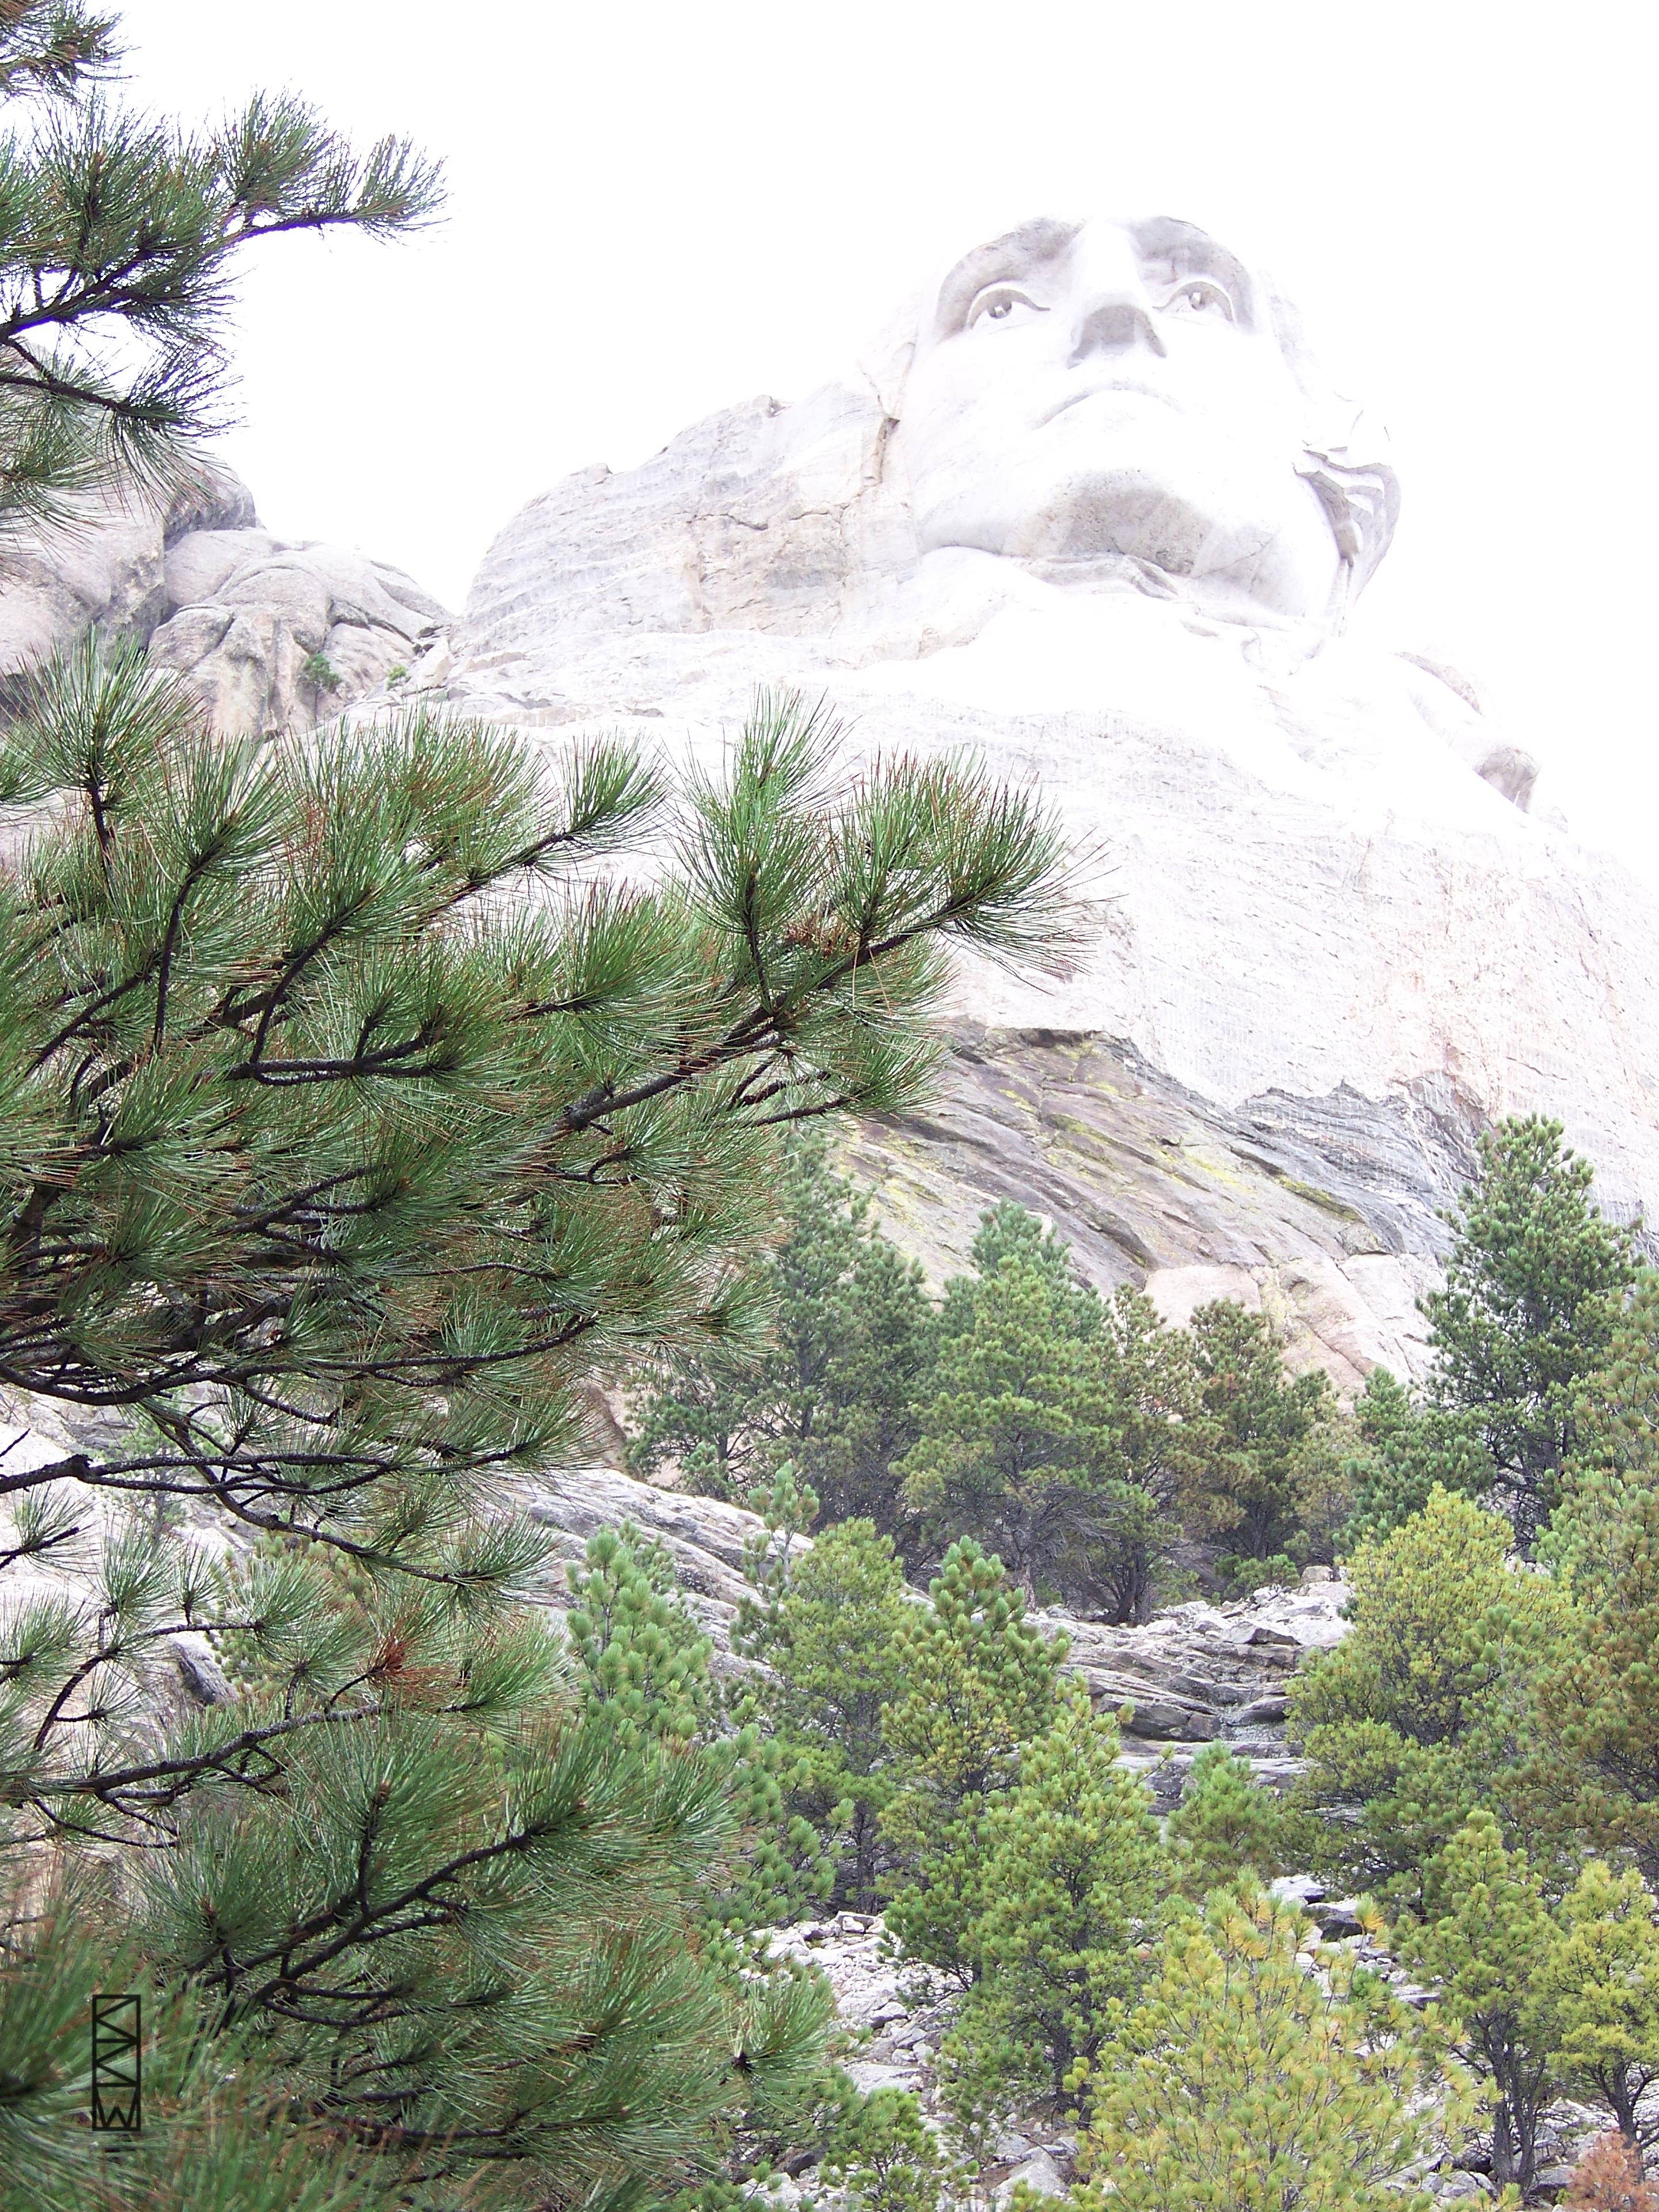 George Washington at Mount Rushmore 08-23-2013 by Crigger